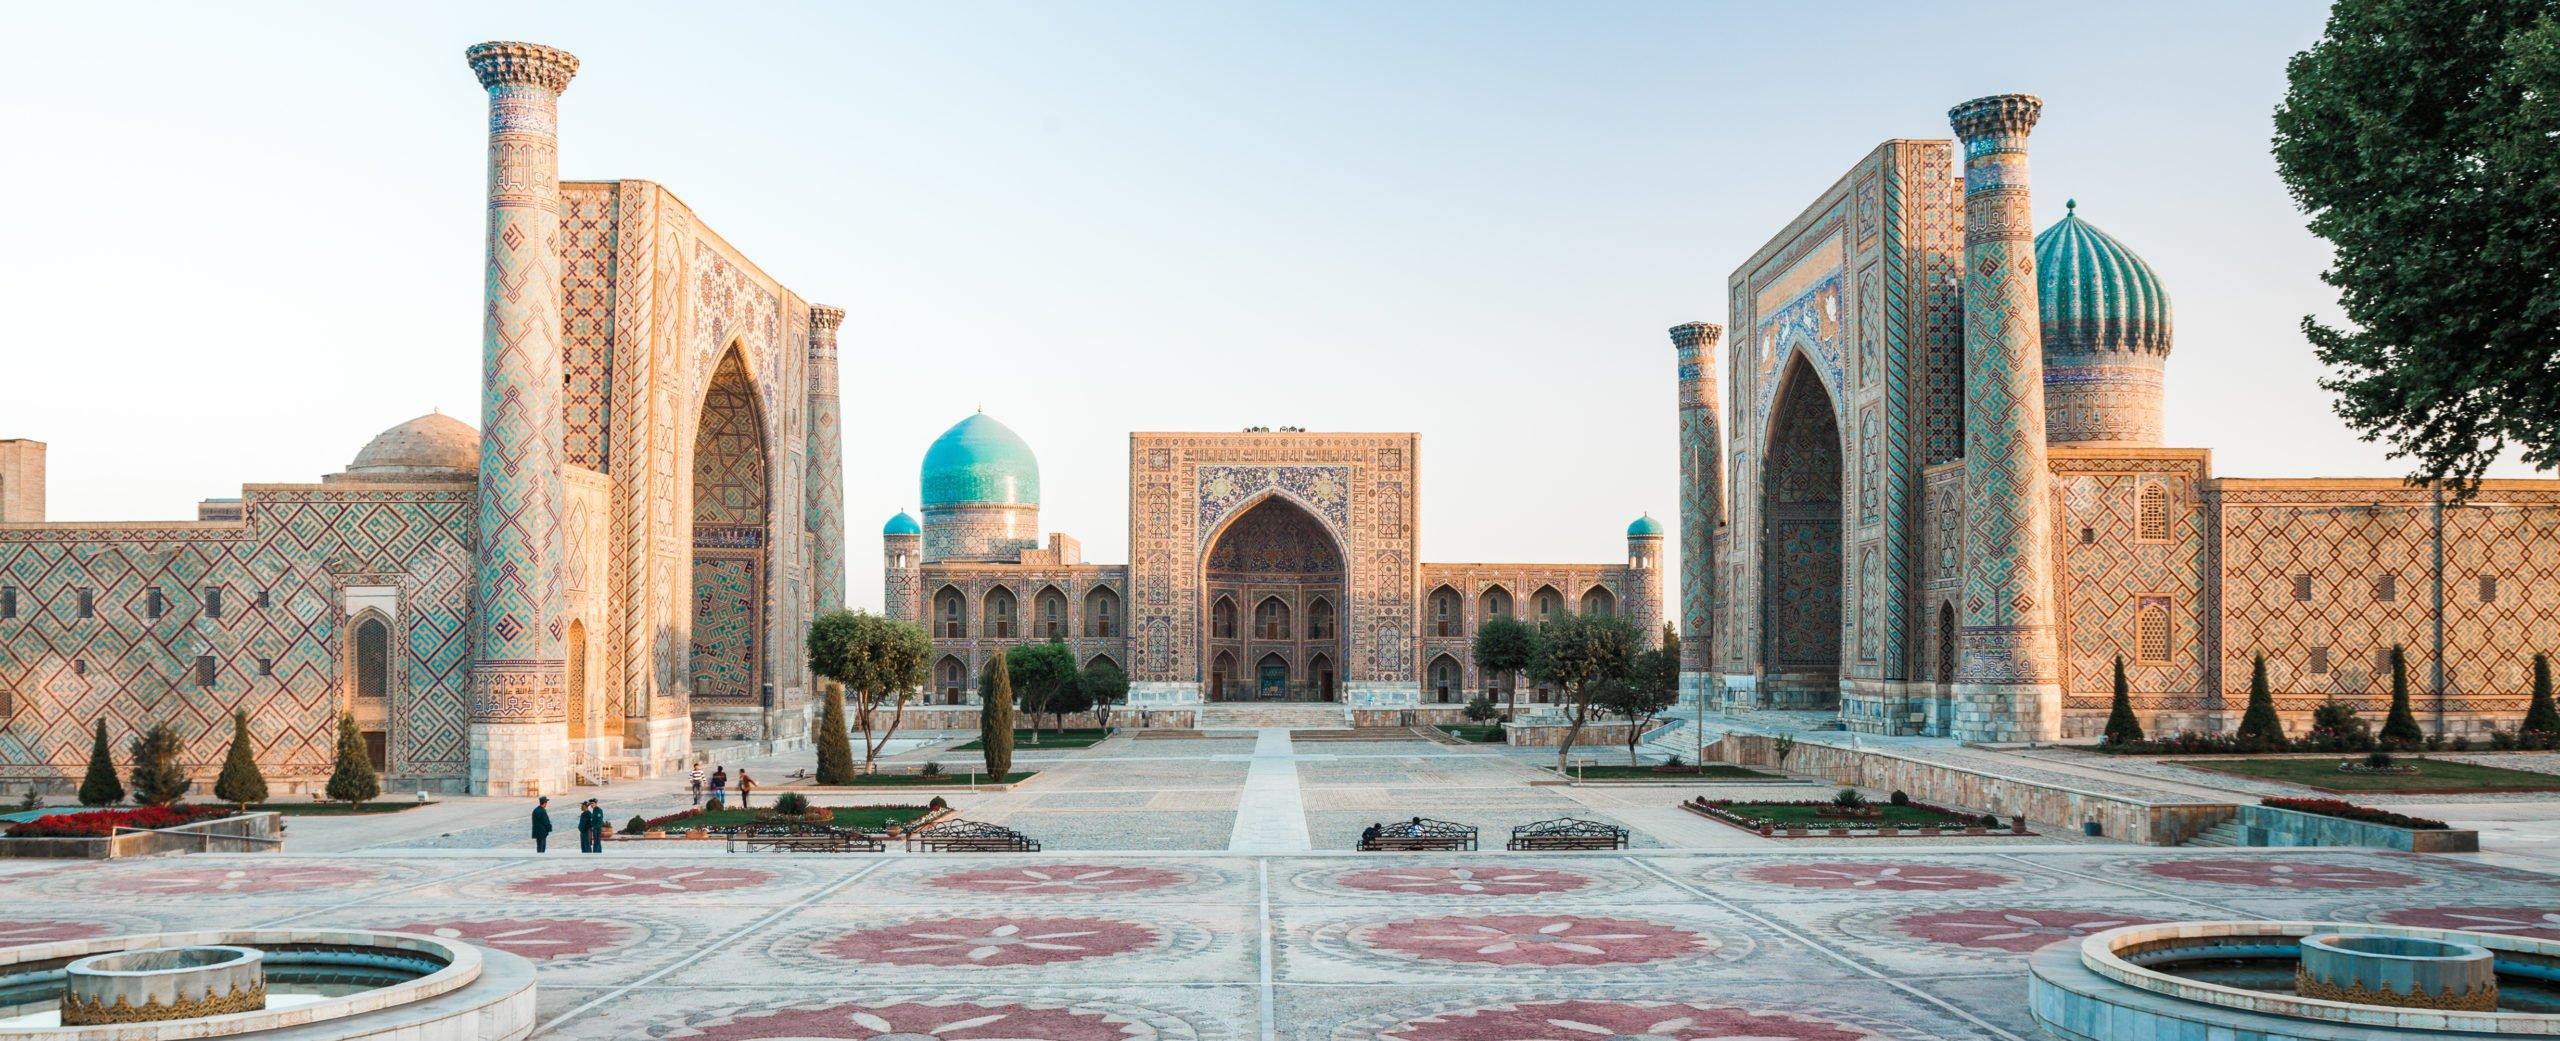 Uzbekistan: Treasures of the Silk Road